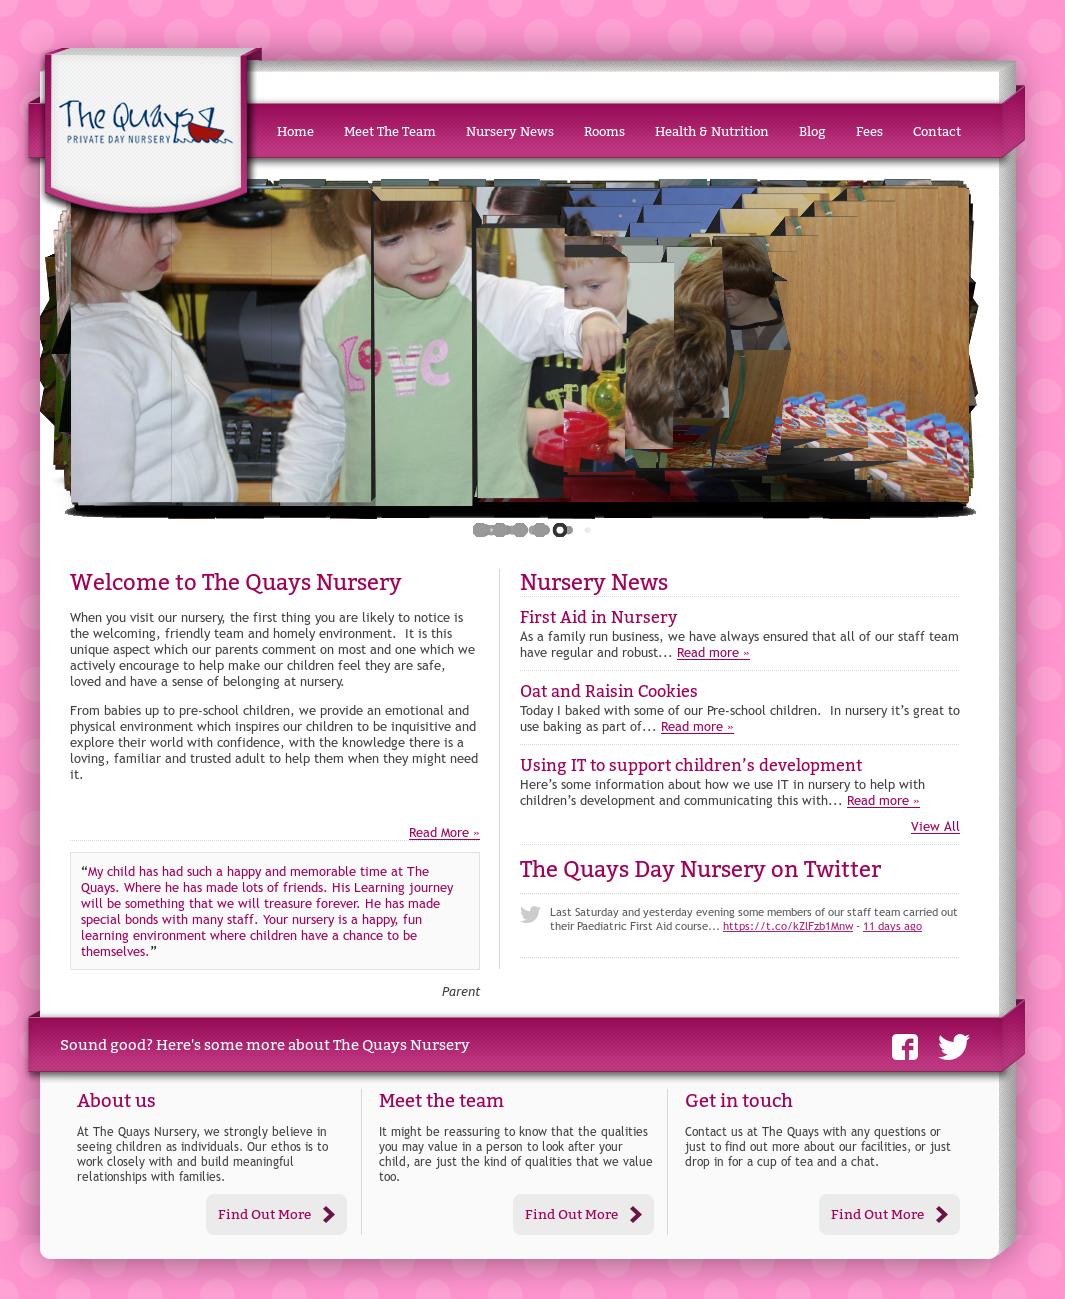 9cdb72f709b Quays Day Nursery & Pre-school Competitors, Revenue and Employees - Owler  Company Profile